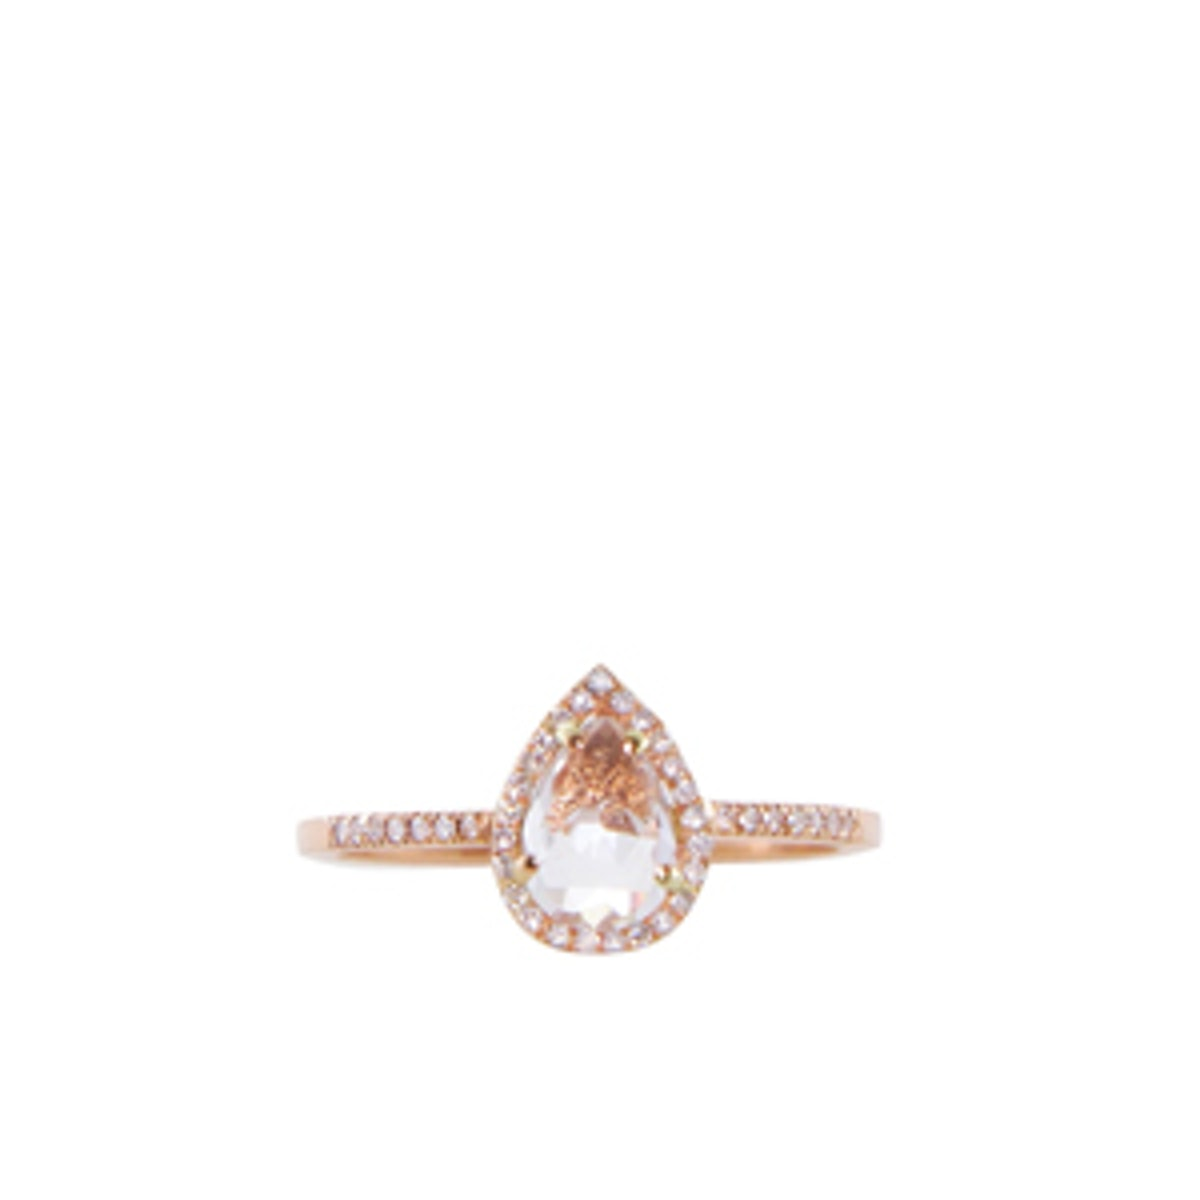 14K Rose Gold Topaz & Diamond Teardrop Ring